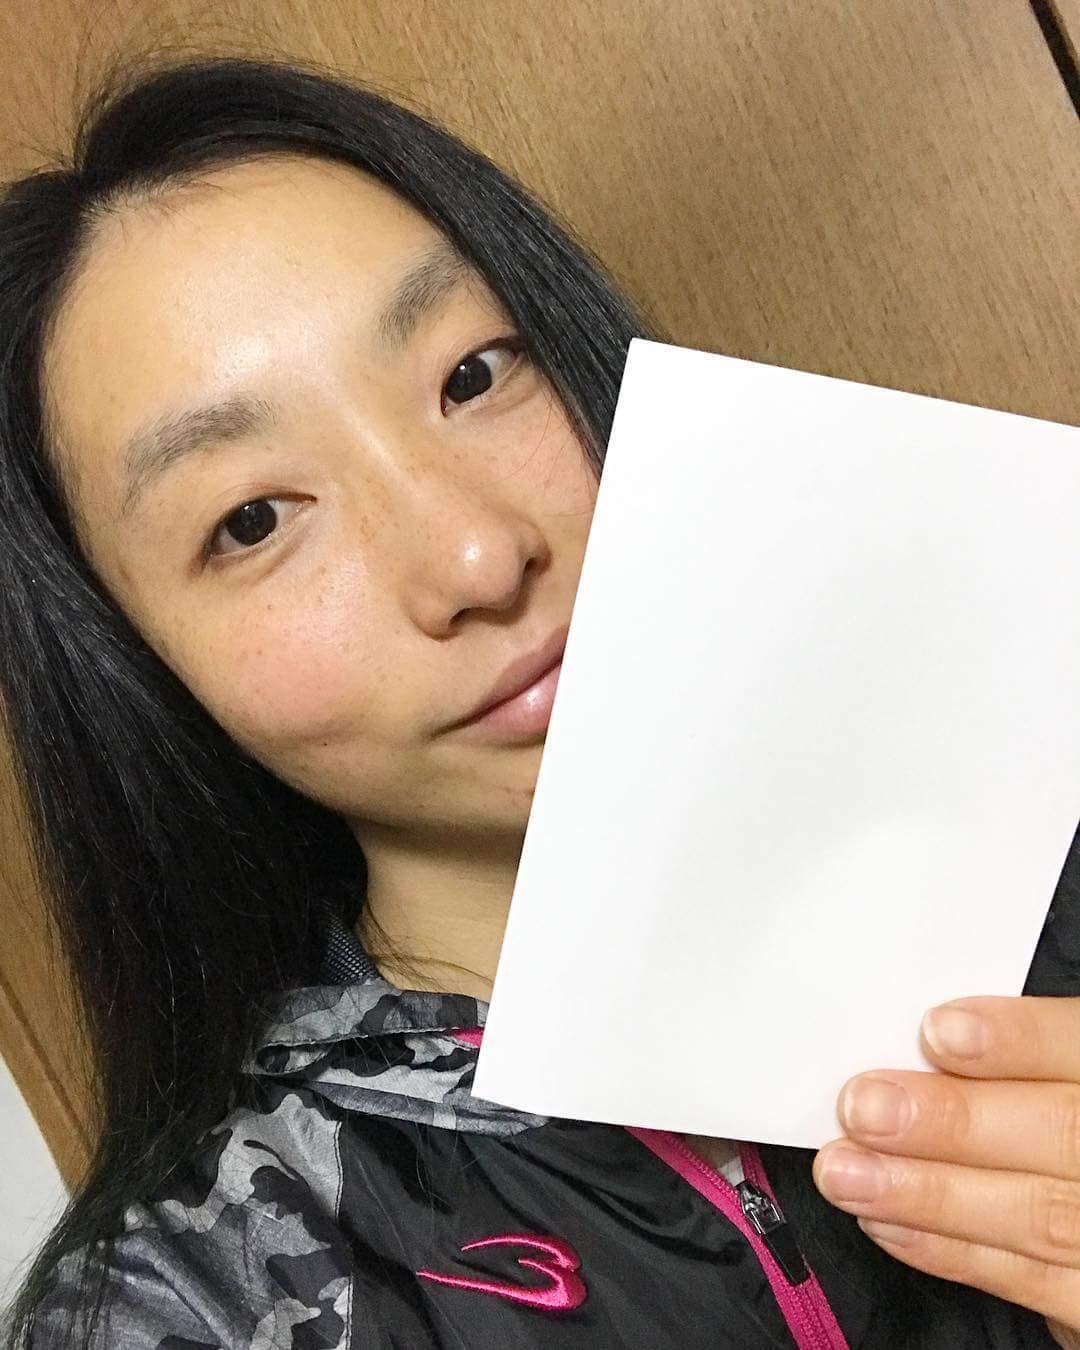 Japan's Mari Amimoto raises the #WhiteCard for #IDSDP2018